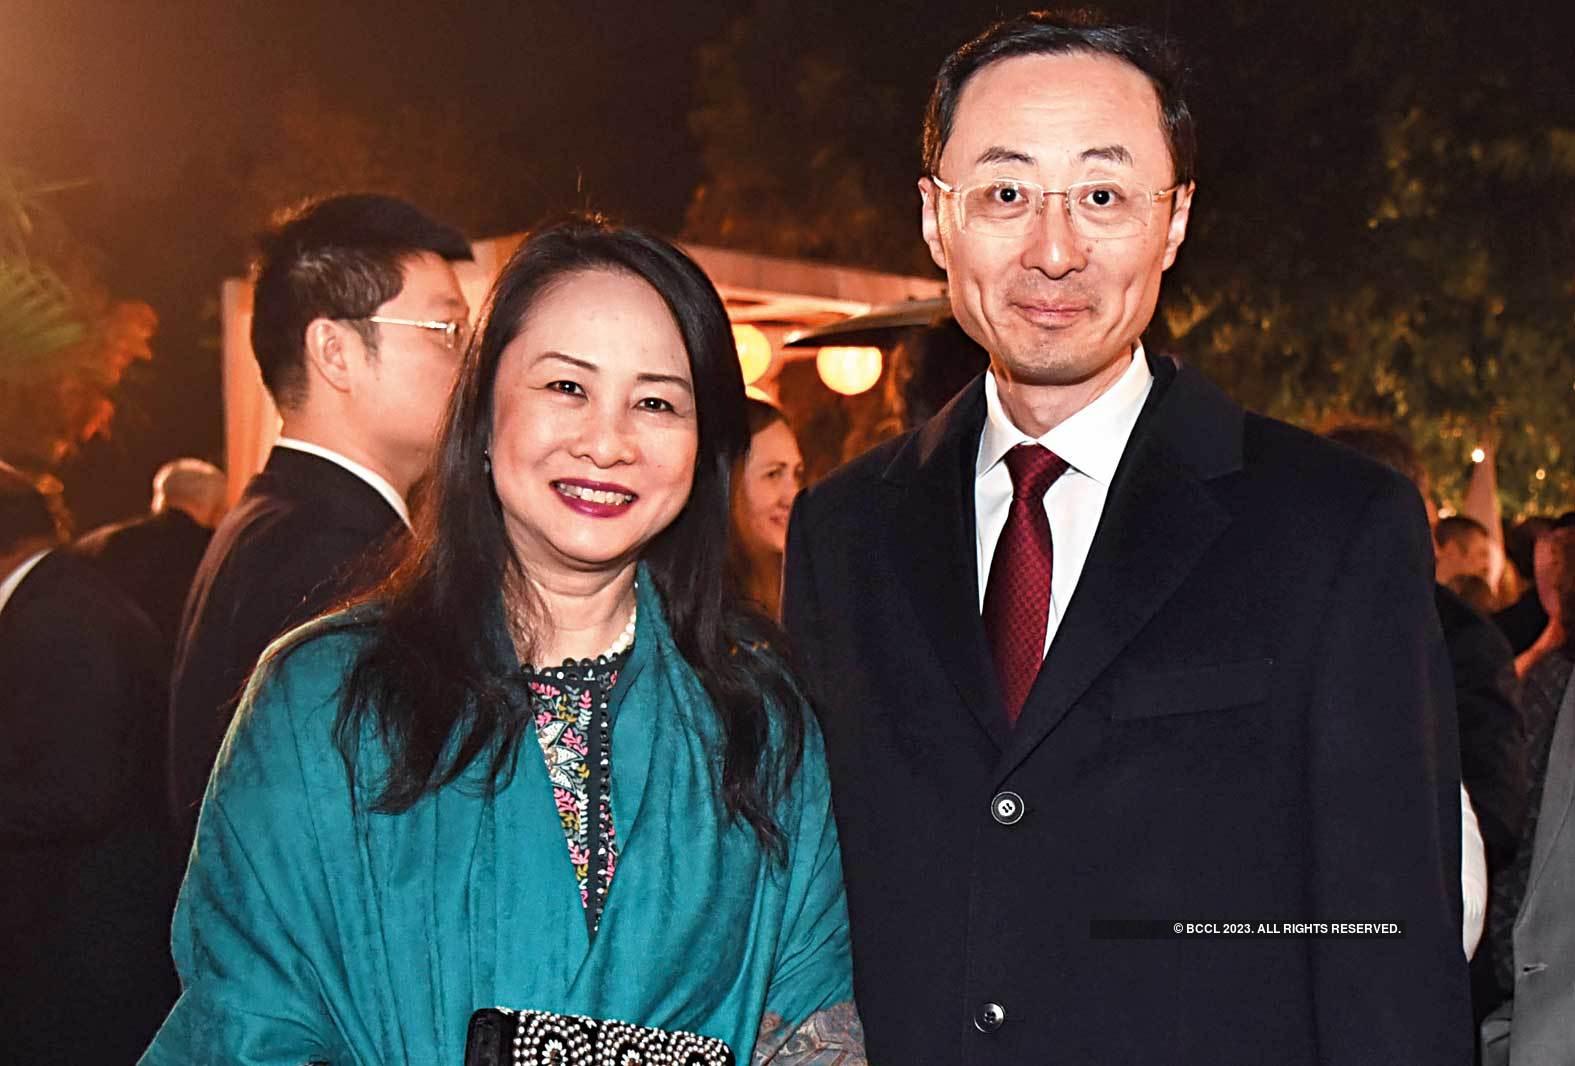 All smiles: Sun Weidong, Ambassador, China, with his wife Bao Jiqing